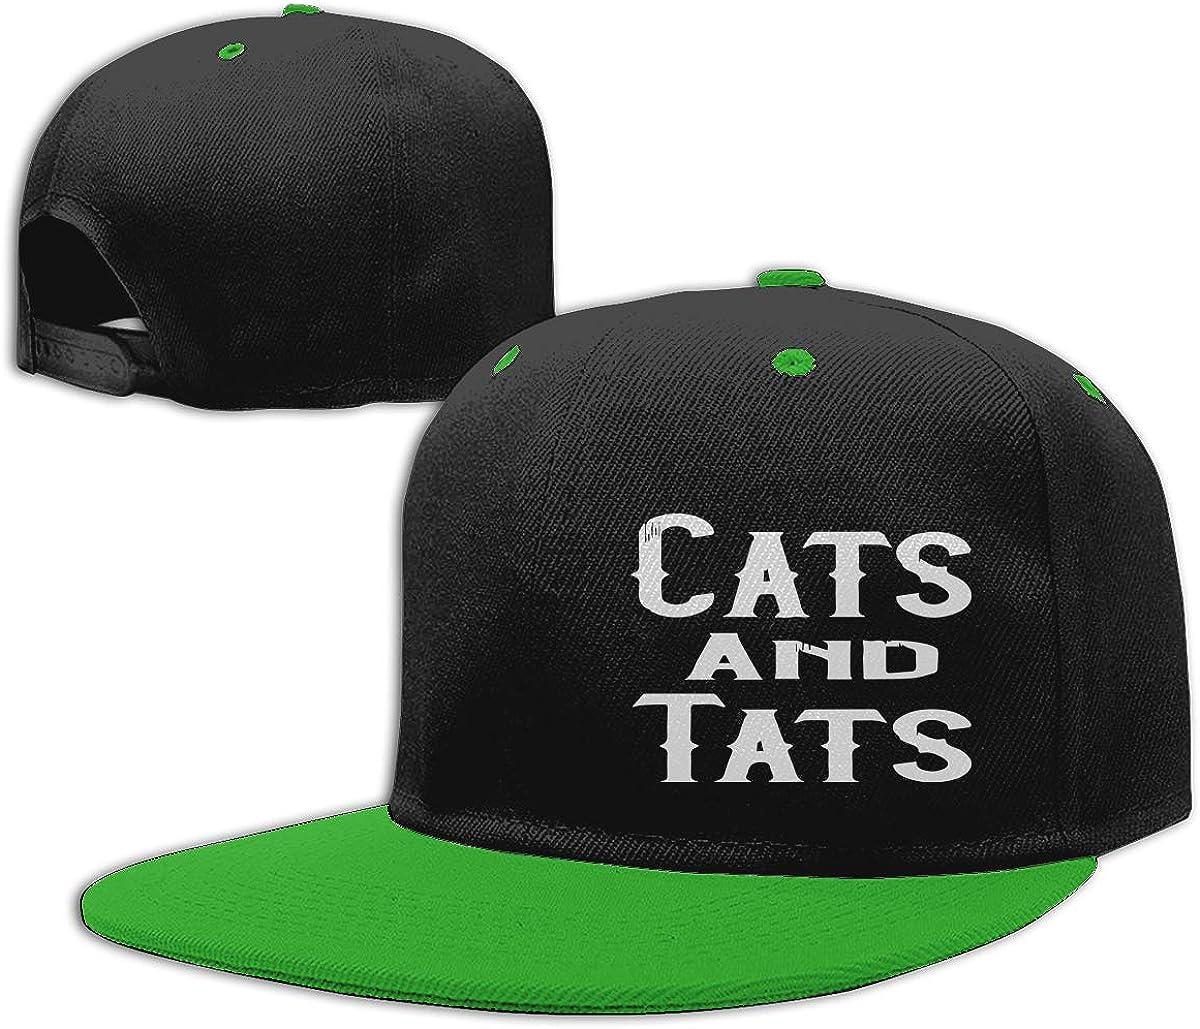 Cats and Tats Fashion Hip Hop Baseball Caps Men and Women Trucker Cap